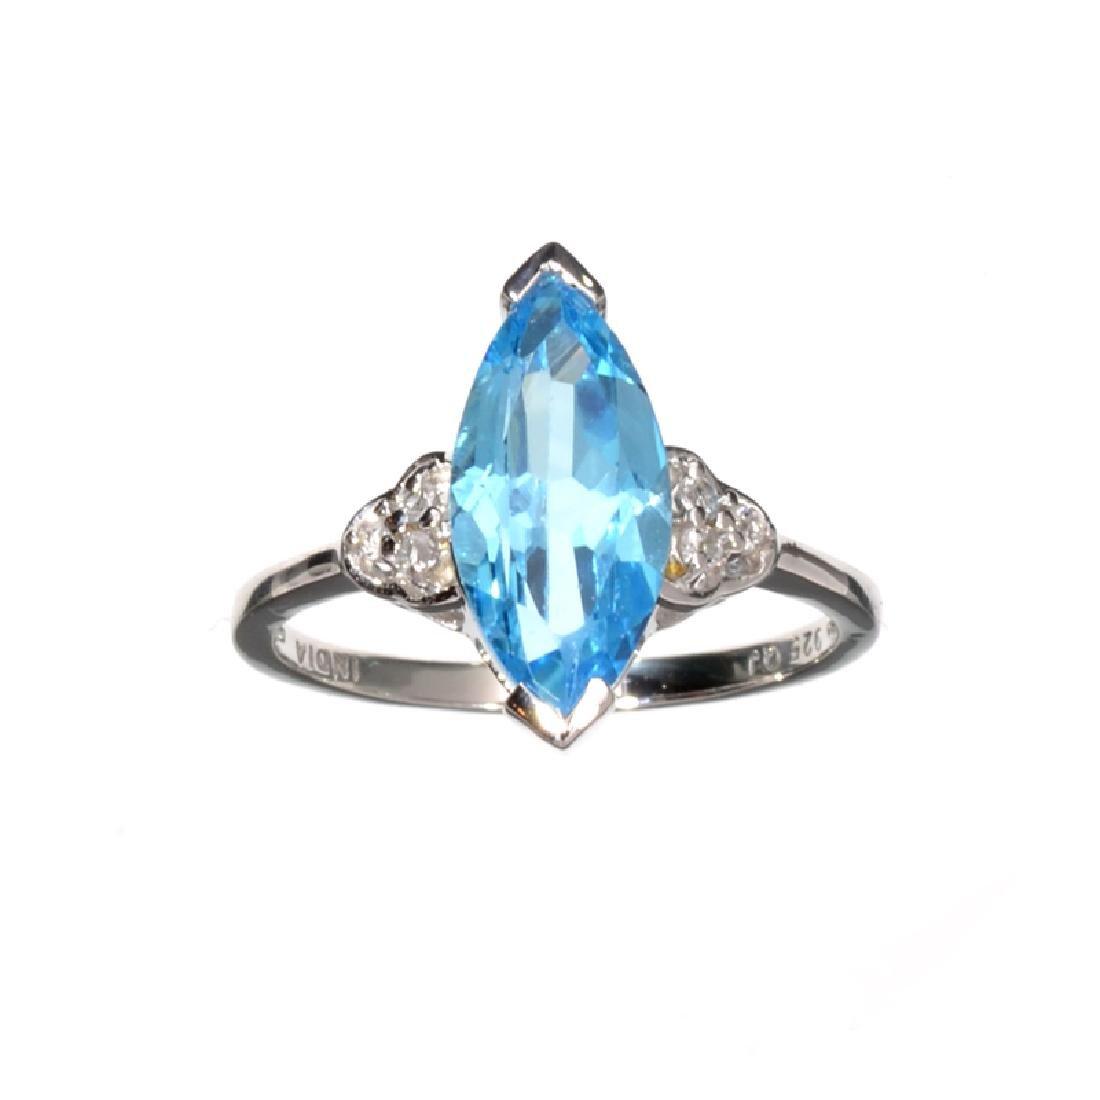 APP: 0.4k Fine Jewelry 3.63CT Blue Topaz And White